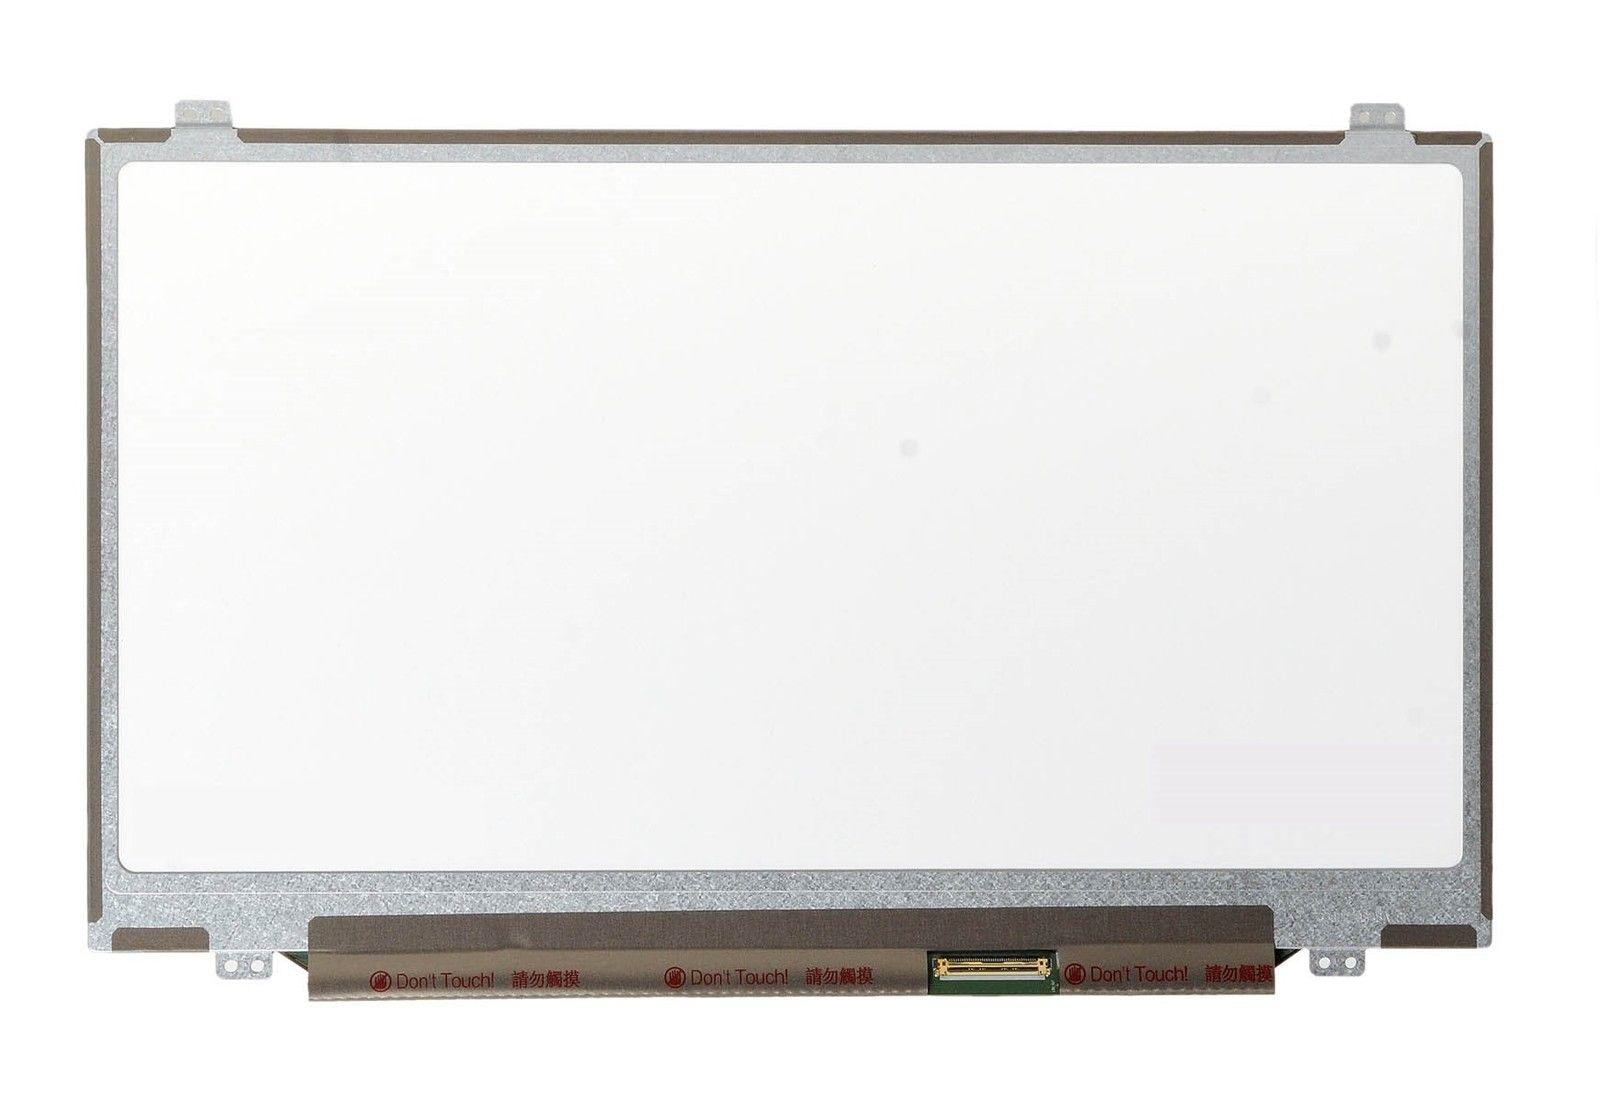 LTN140AT22-S01 New 14.0 WXGA HD Slim LED LCD Screen Display LTN140AT22-D01 Panel ht140wxb 501 new 14 0 led lcd screen wxga hd panel display